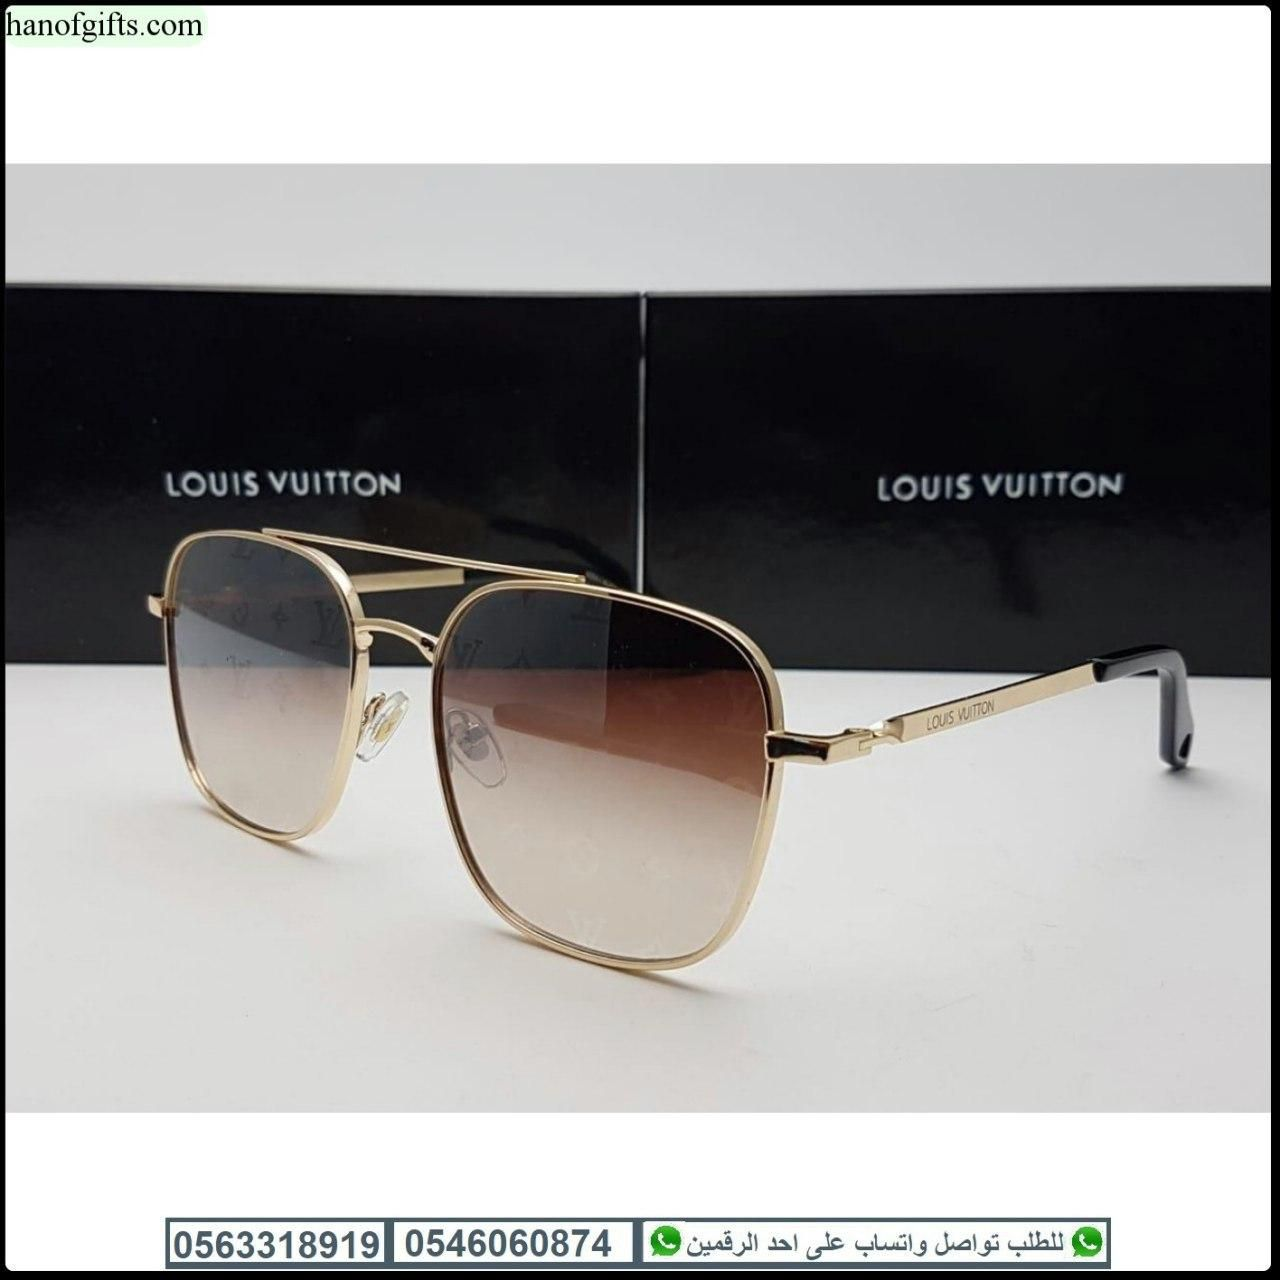 نظارات لويس فيتون رجاليه Louis Vuitton مع جميع ملحقاتها و بنفس اسم الماركه هدايا هنوف Sunglasses Glasses